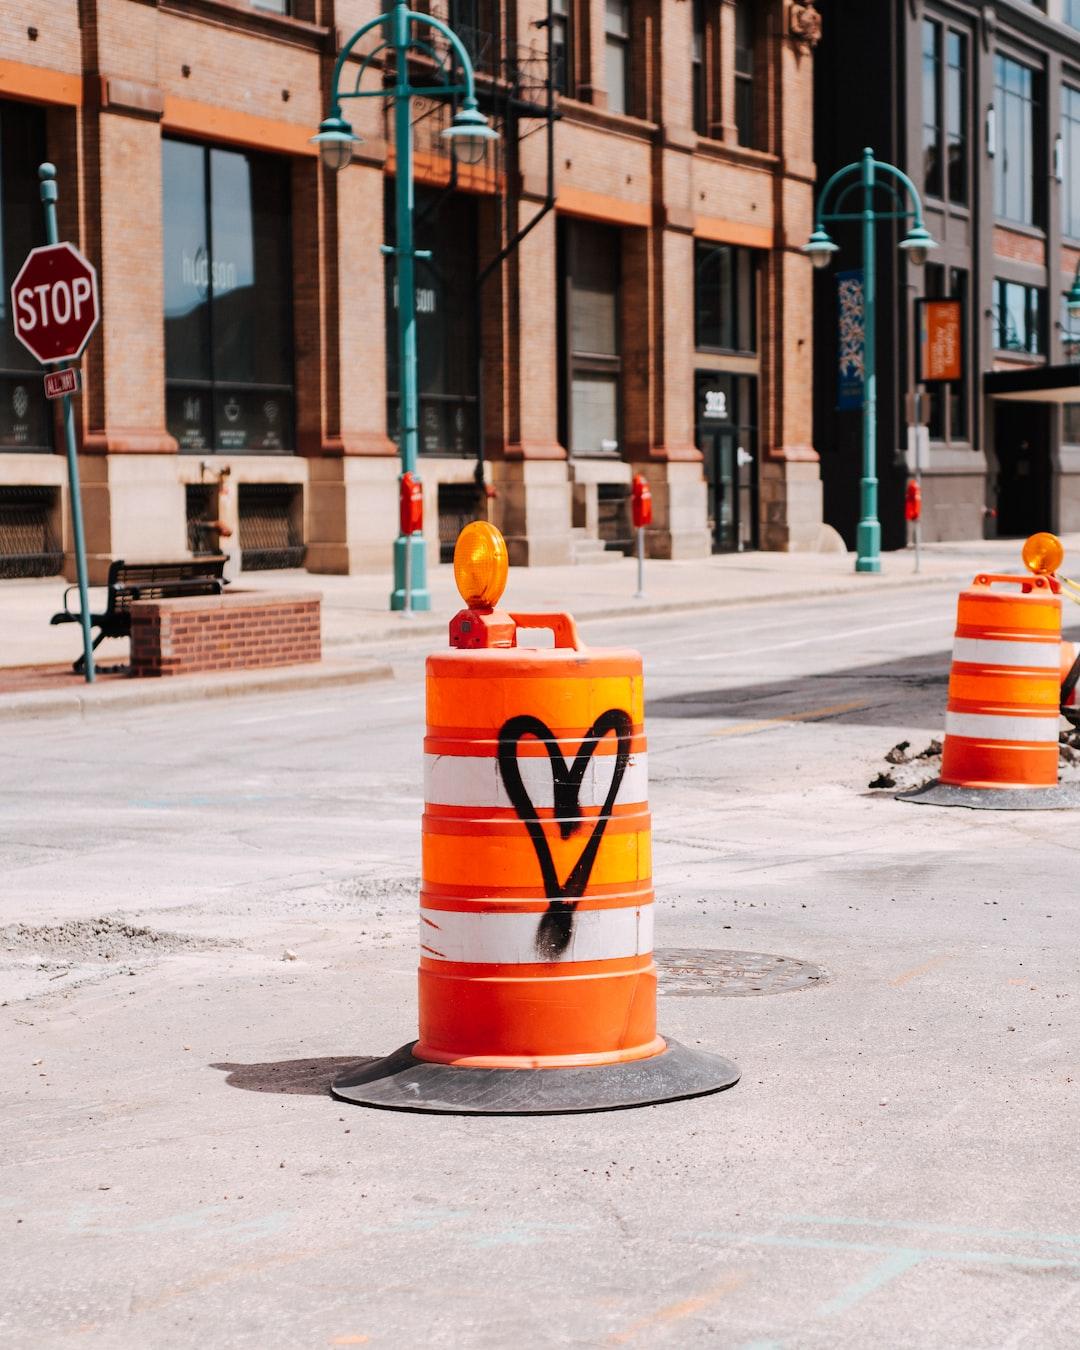 A graffiti heart left on an orange cone, in Milwaukee's Third Ward.